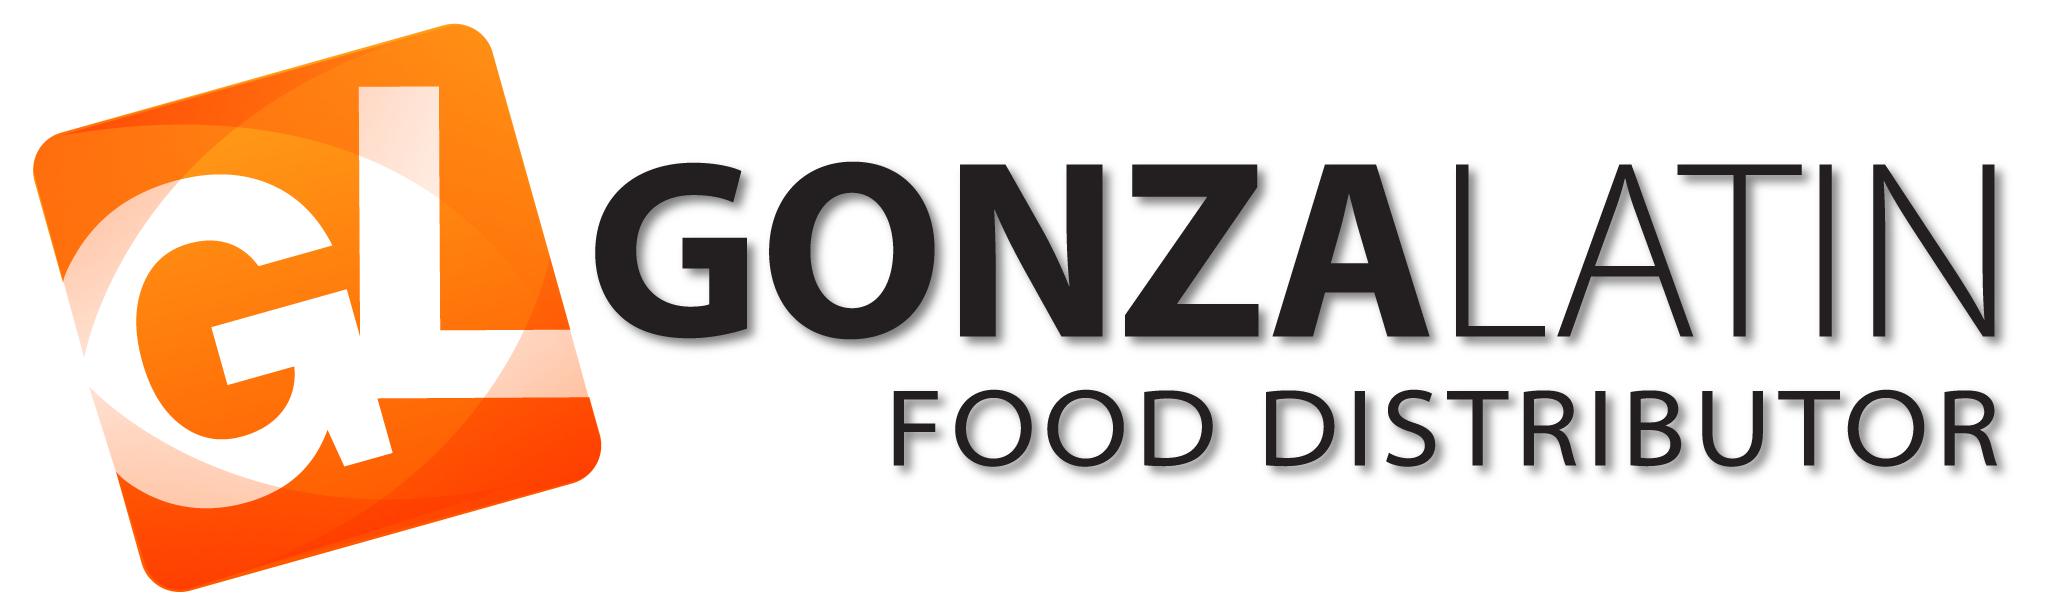 GONZALATIN Food Distributor